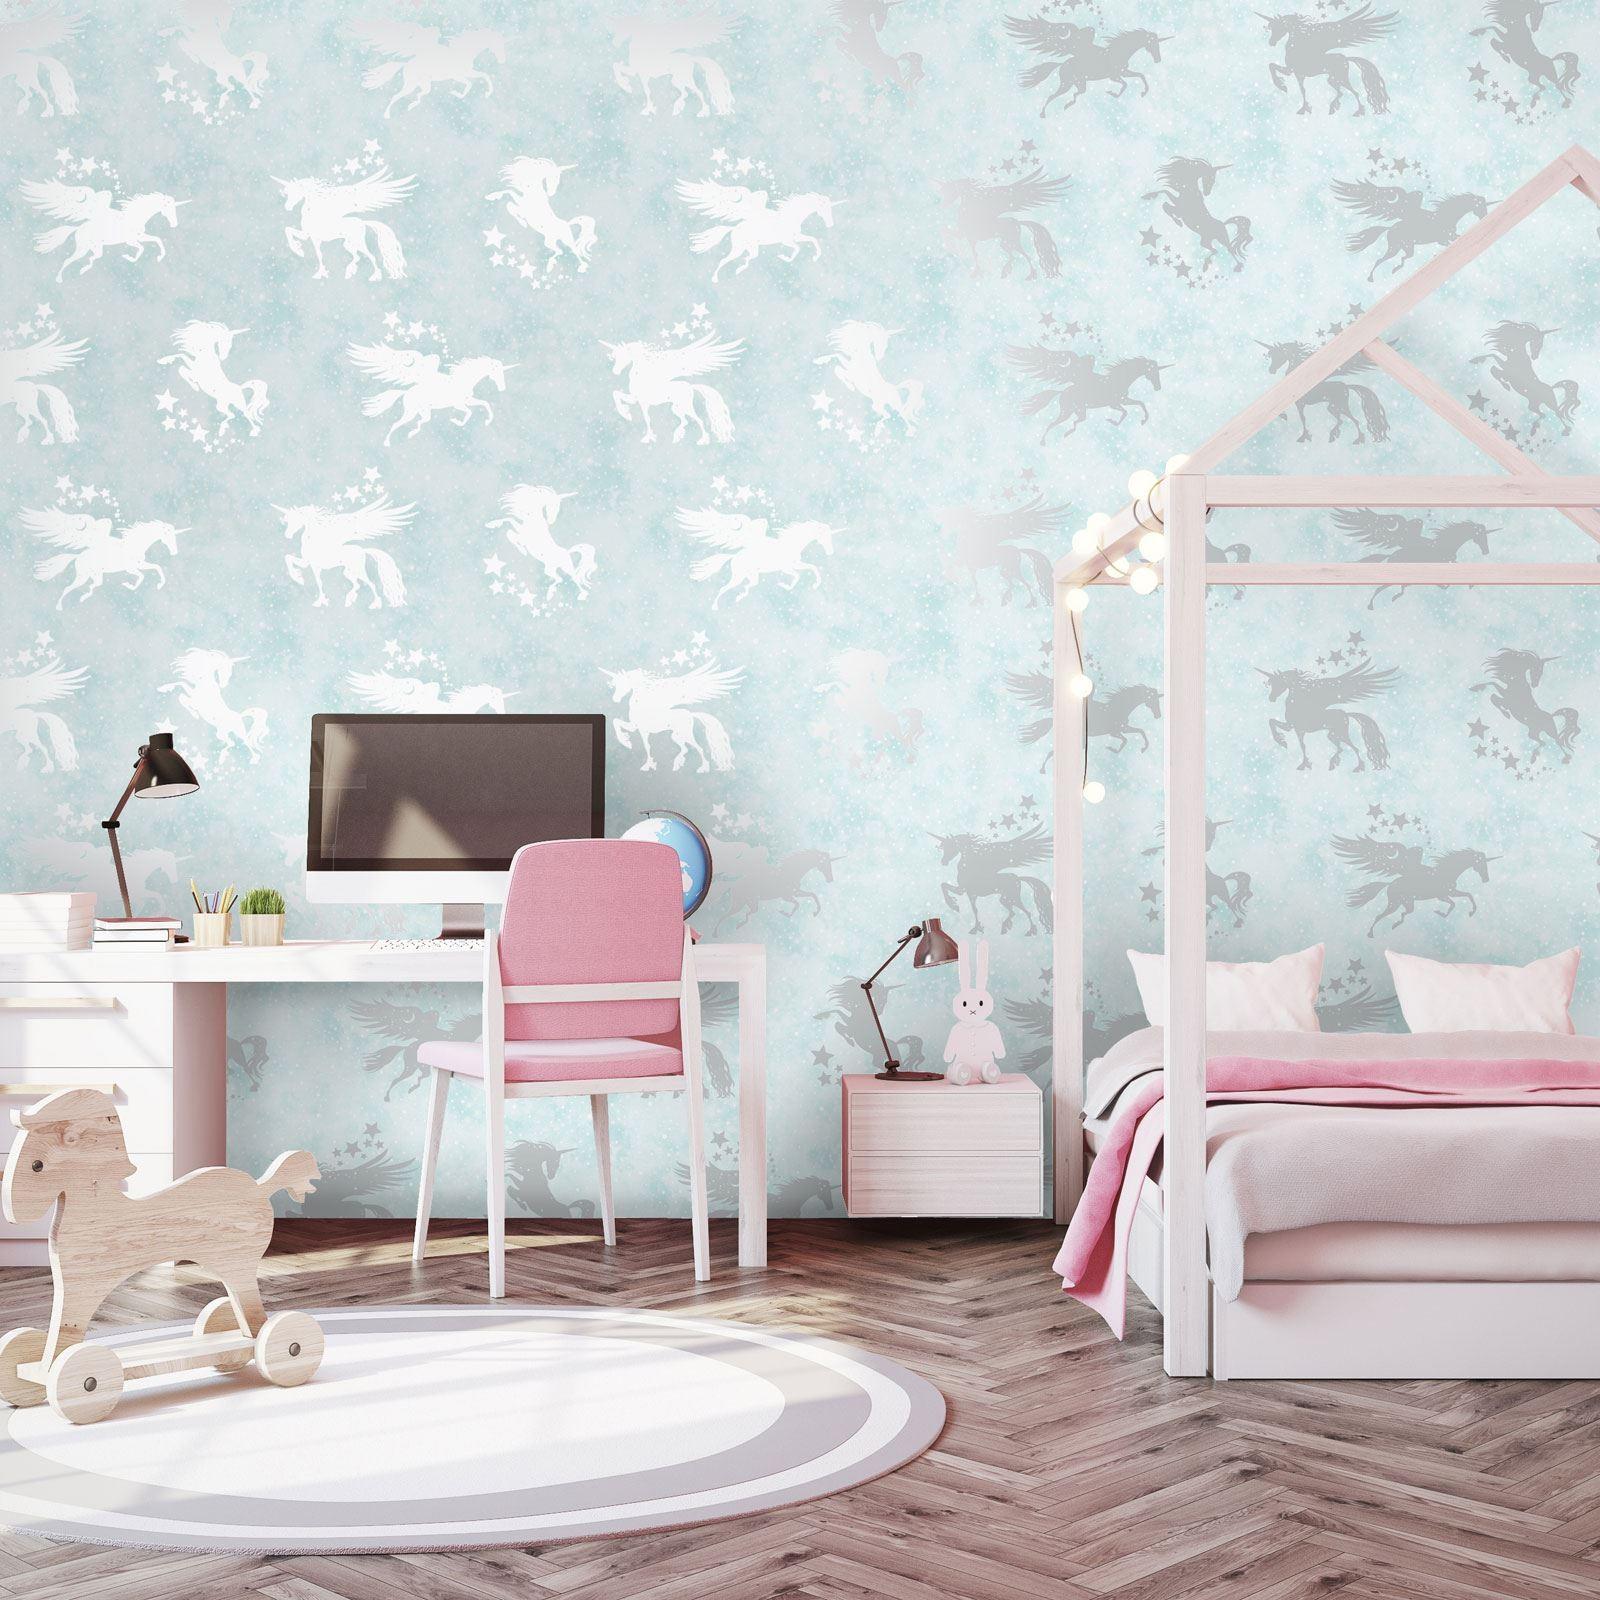 ديكورات غرف نوم للبنات 2021-ورق حائط حصان